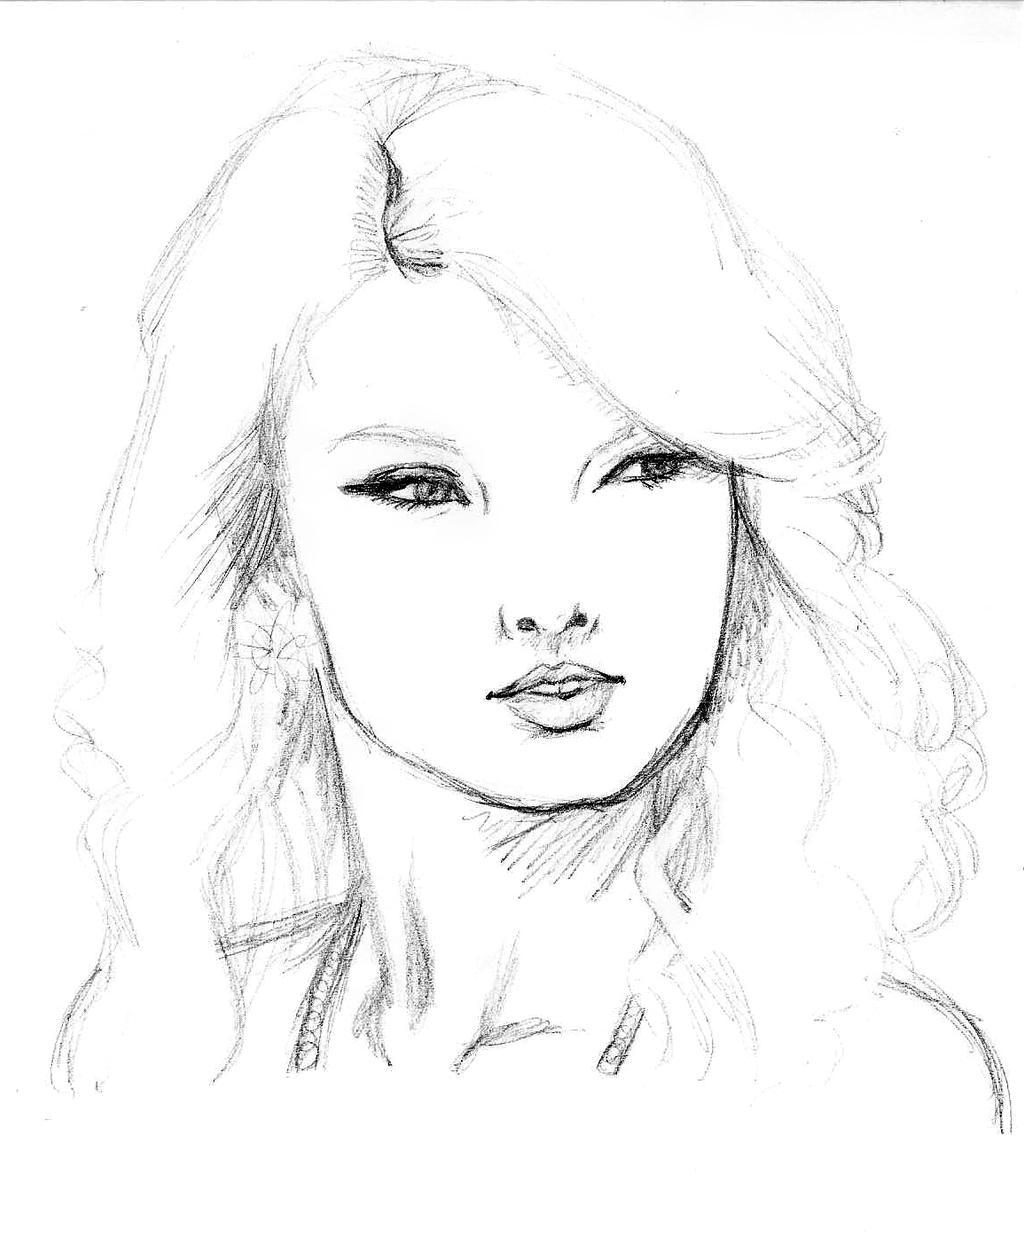 Taylor Swift - Sketch by Dariosuper - 154.4KB